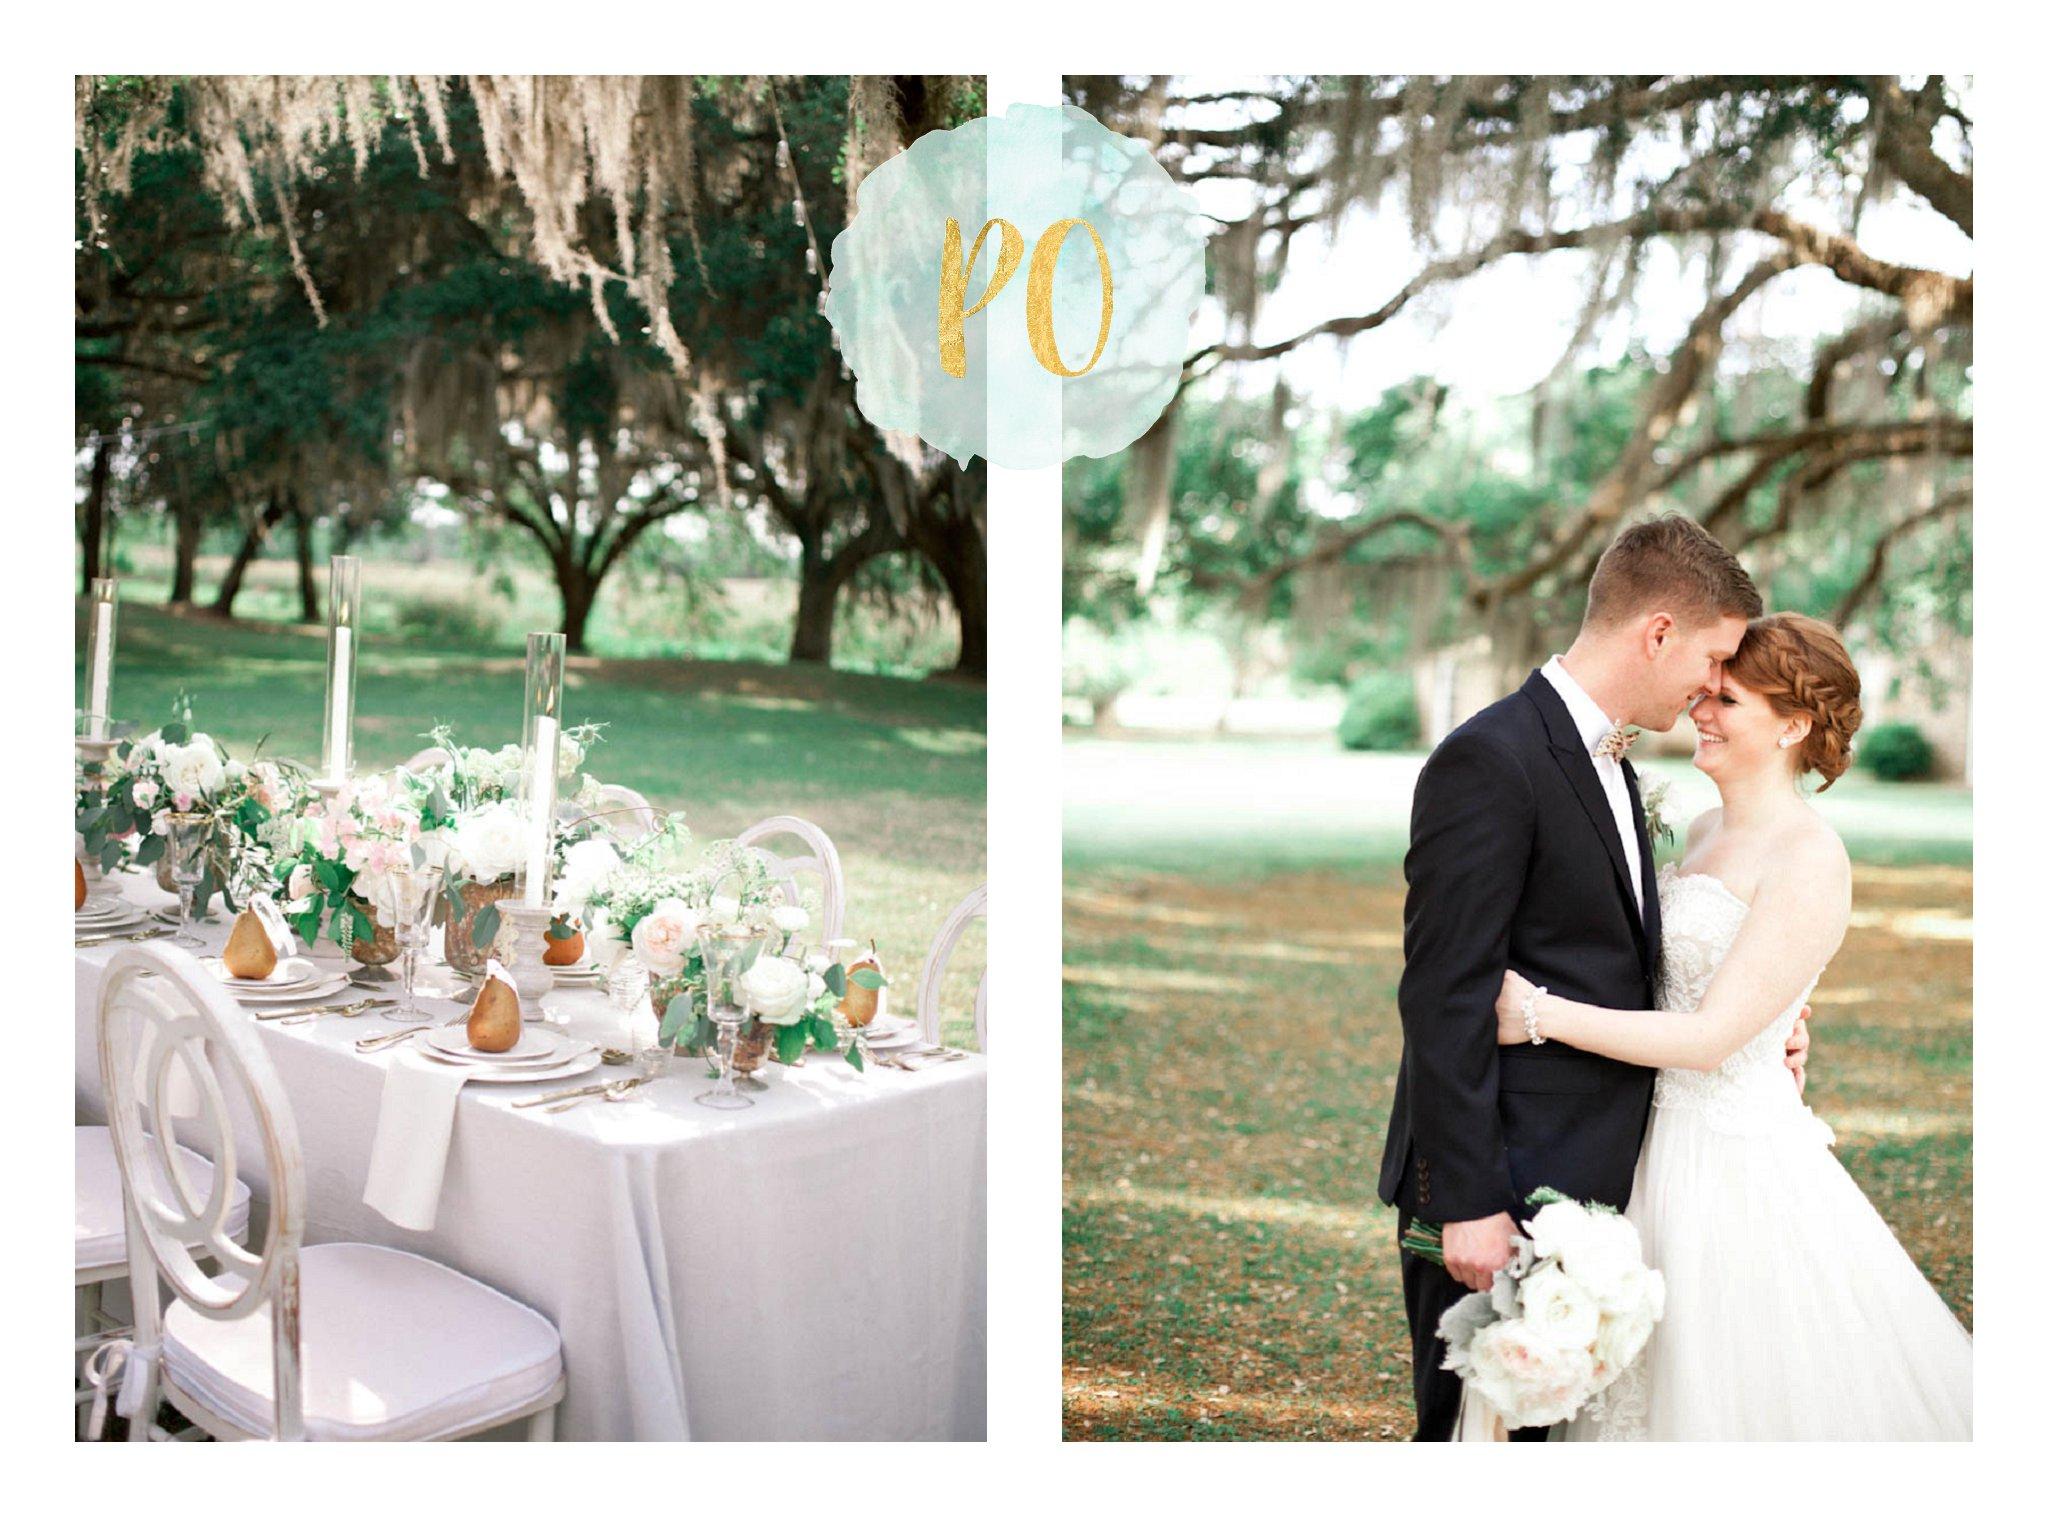 the-litchfield-plantation-pawleys-island-sc-wedding-photos_0032.jpg